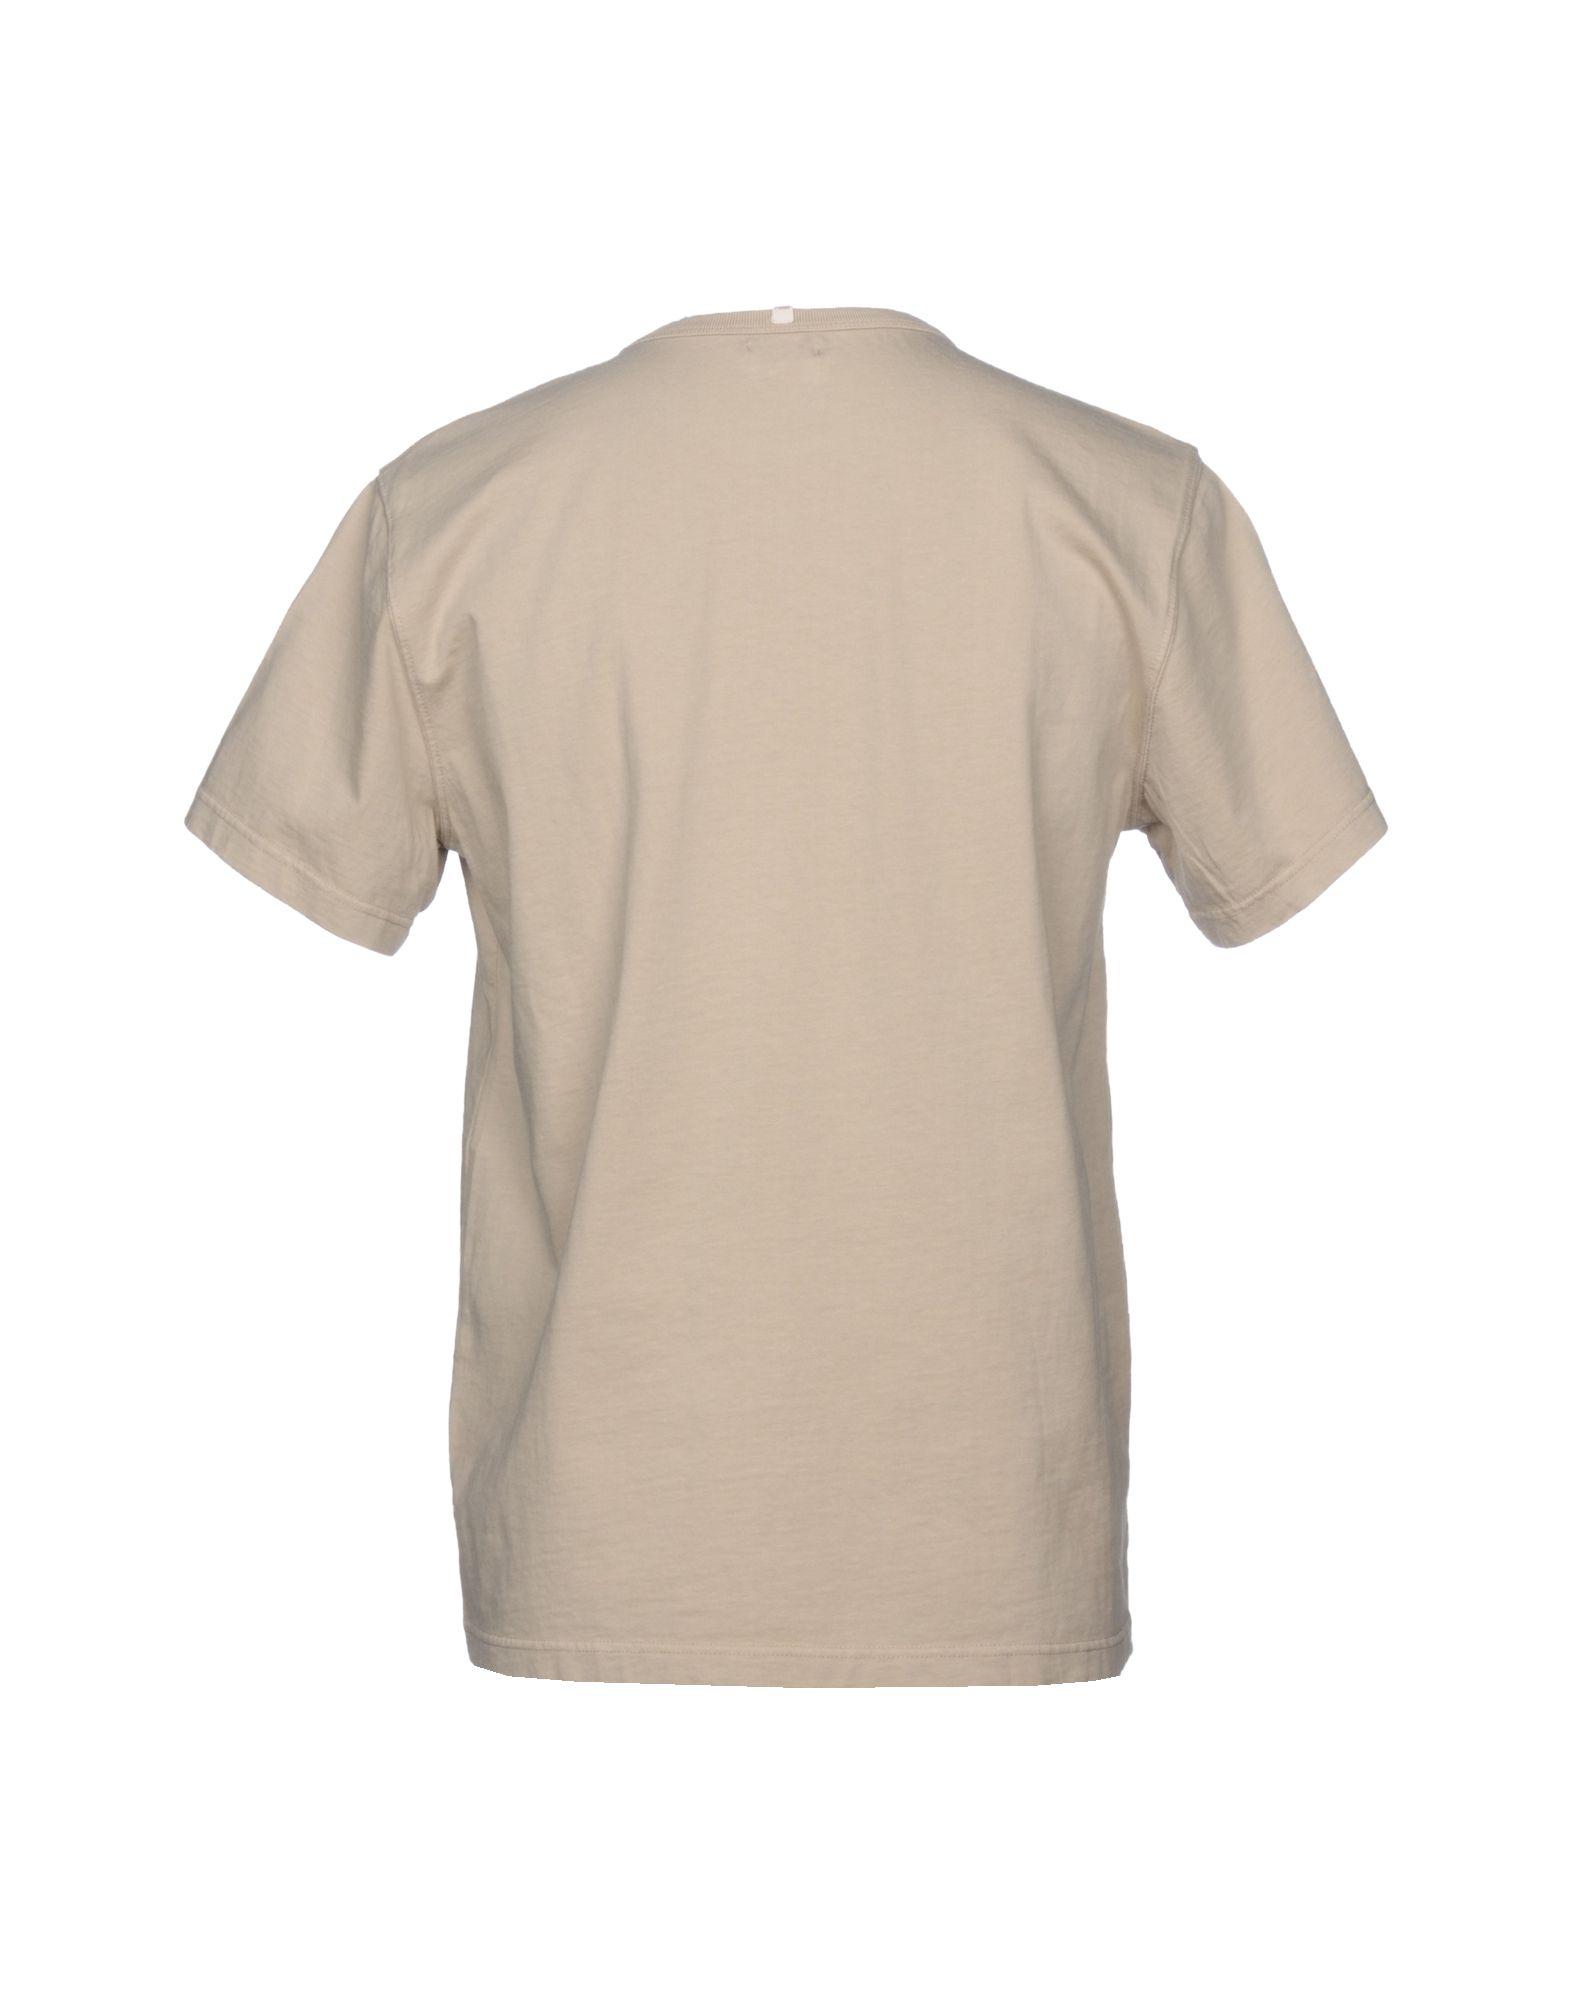 T-Shirt (+) People People (+) Uomo - 12170182PX a672b8